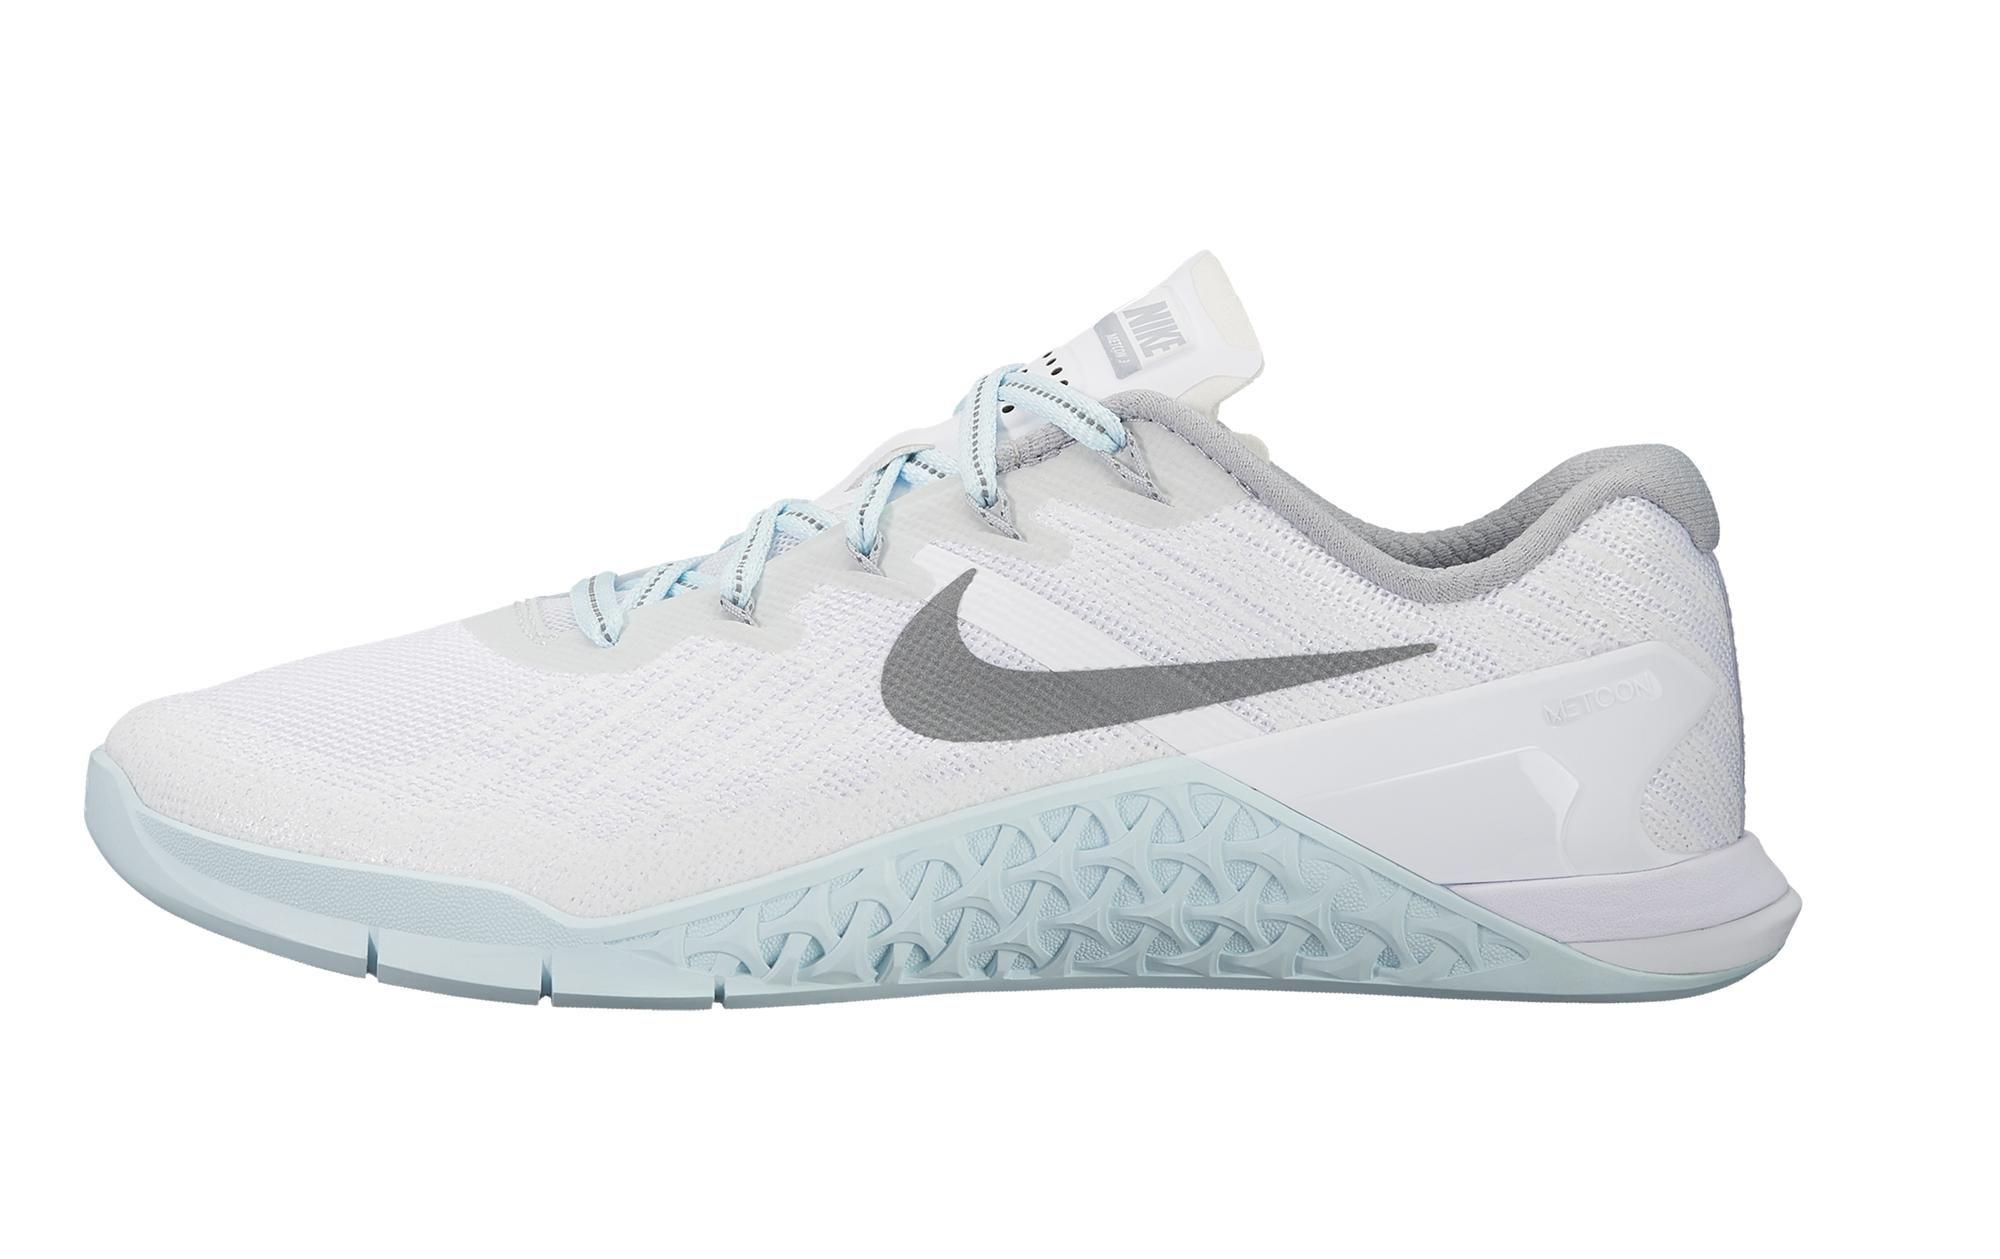 9d4cf5cc1039 Nike Metcon 3 - Women s - Reflective White   Silver   Glacier Blue ...